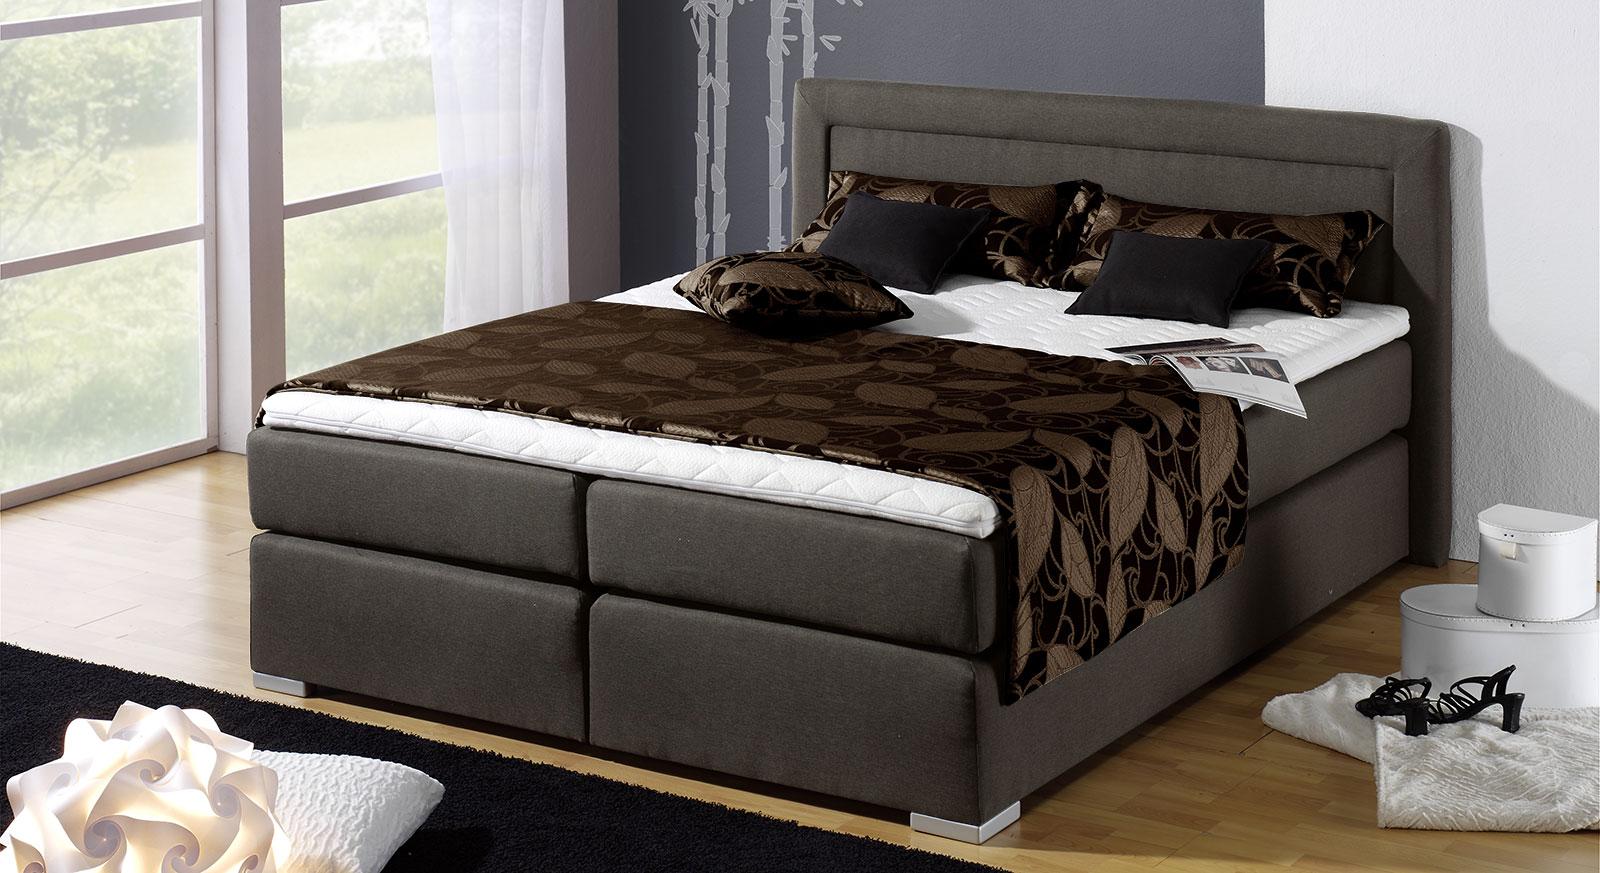 boxspring bett g nstig kaufen bei. Black Bedroom Furniture Sets. Home Design Ideas